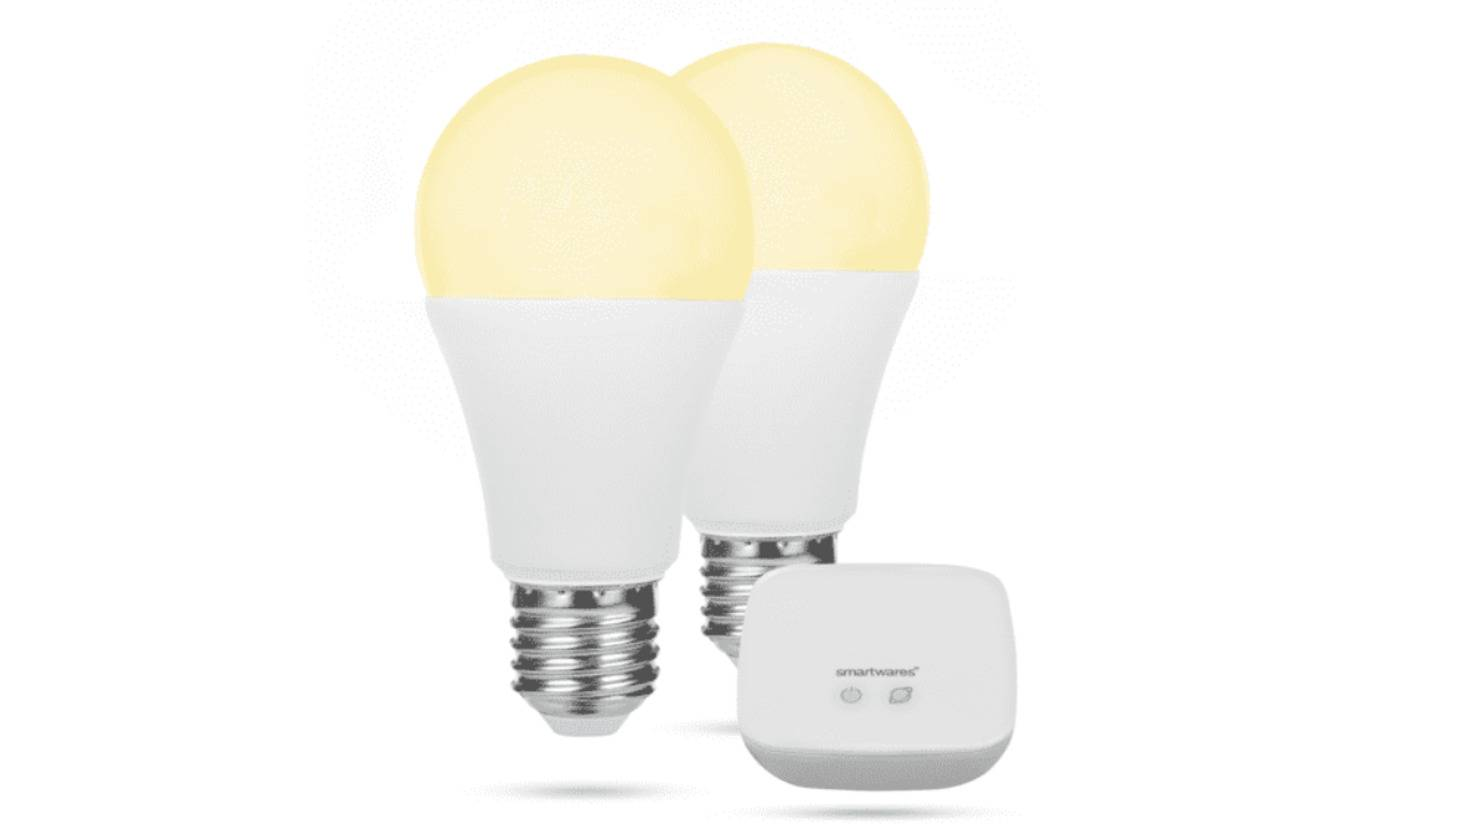 Smartwares glühbirnen